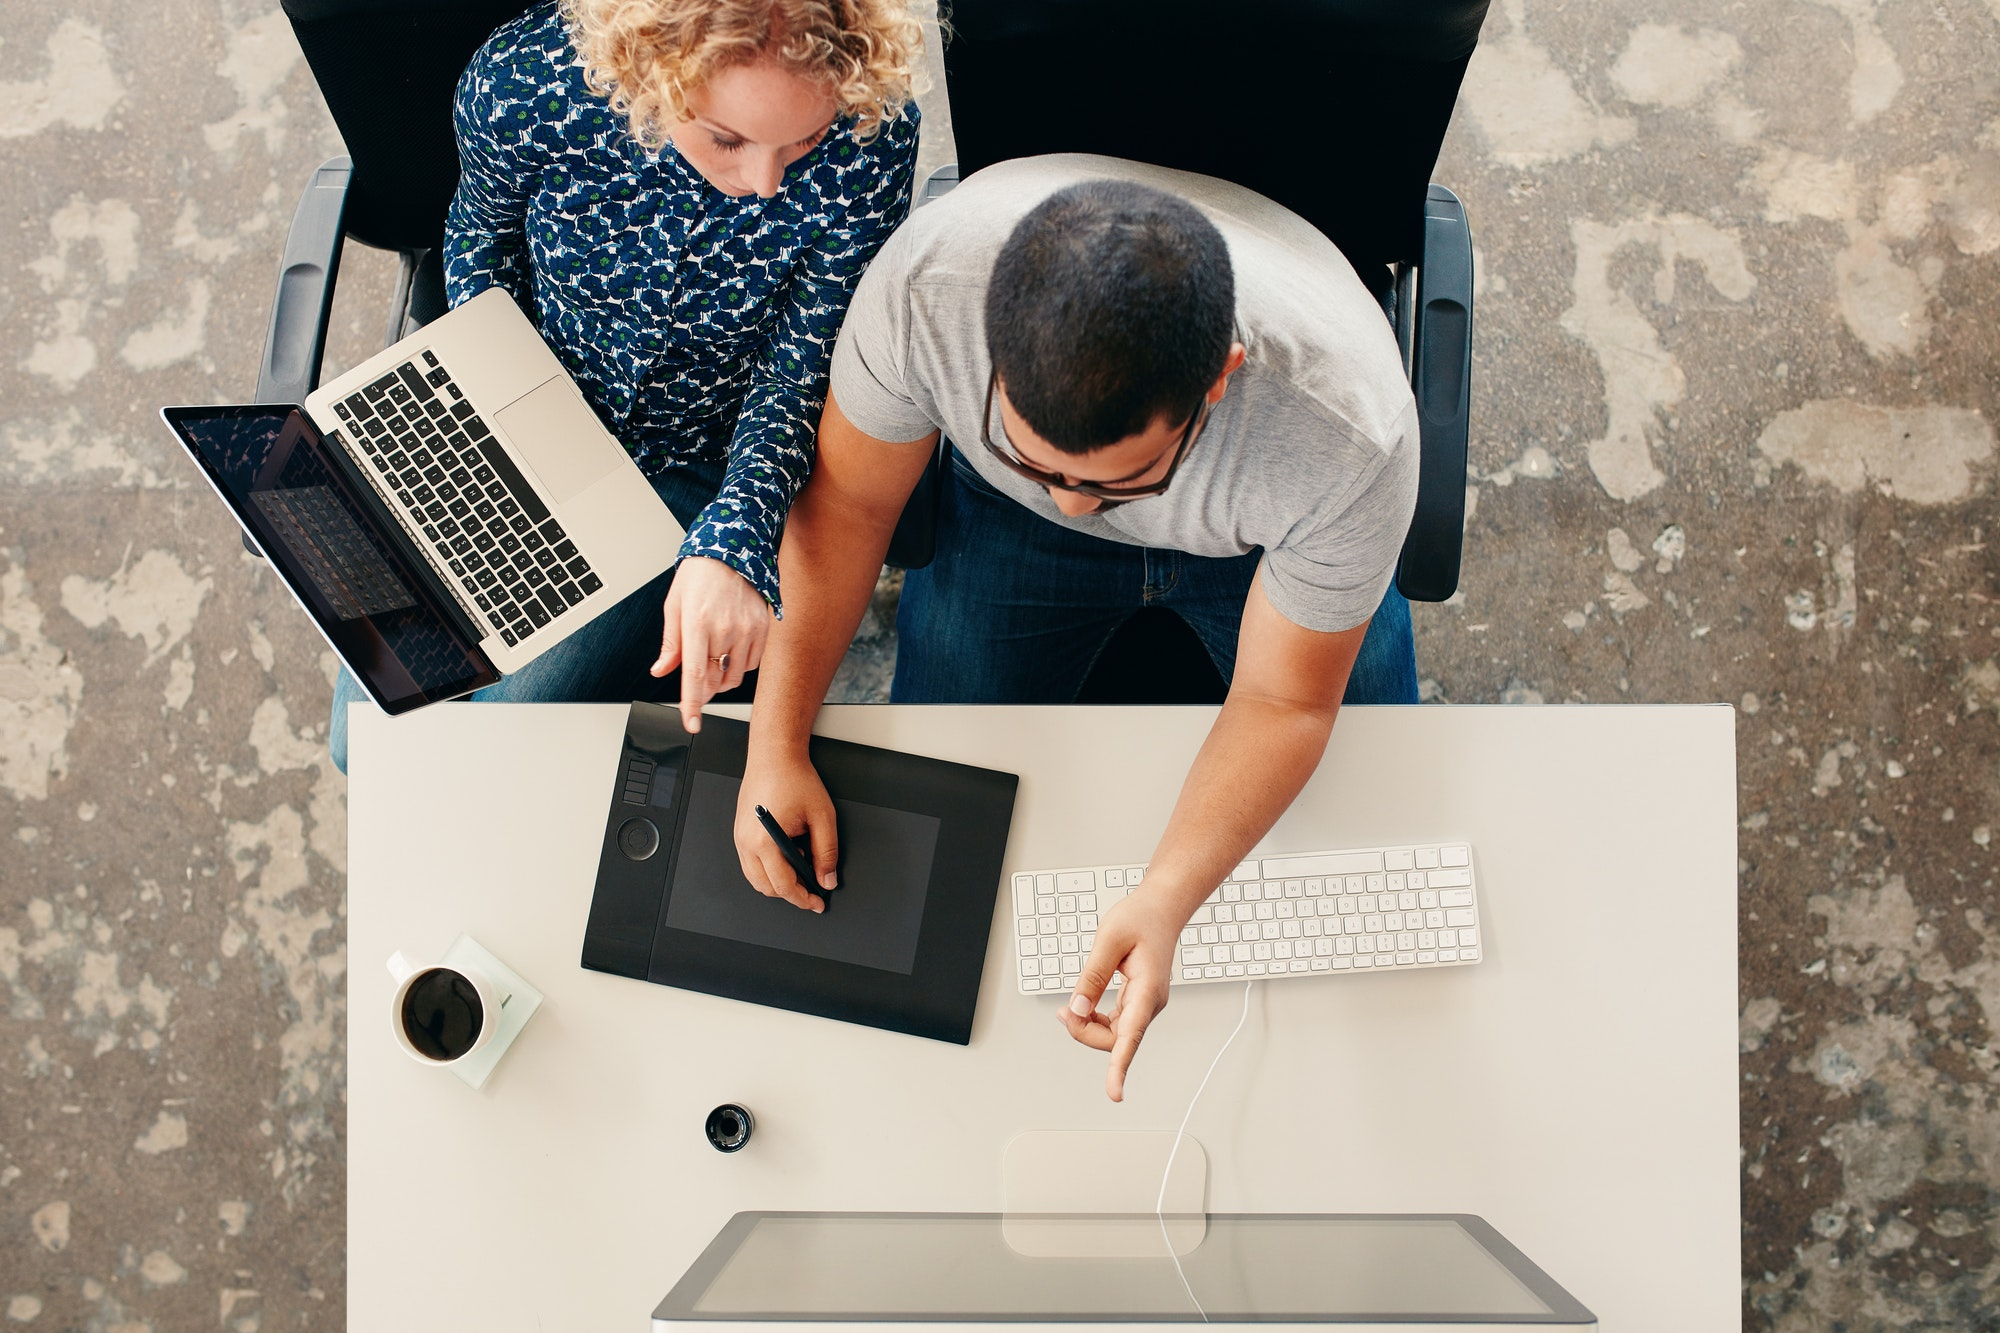 Designers team working together